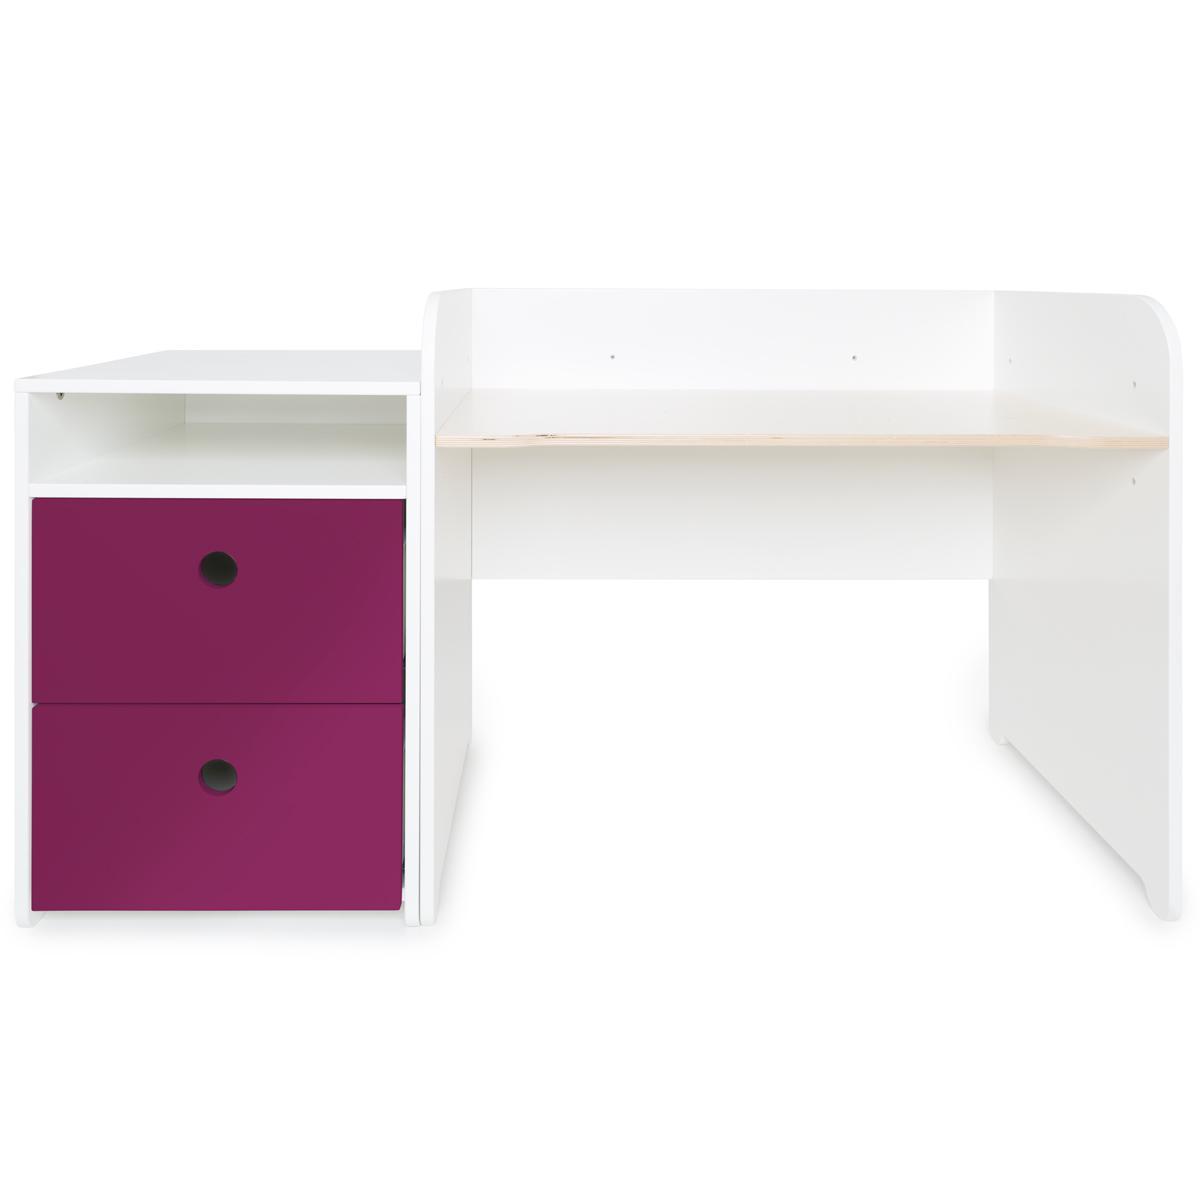 Bureau évolutif-petit meuble 2 tiroirs COLORFLEX Abitare Kids plum